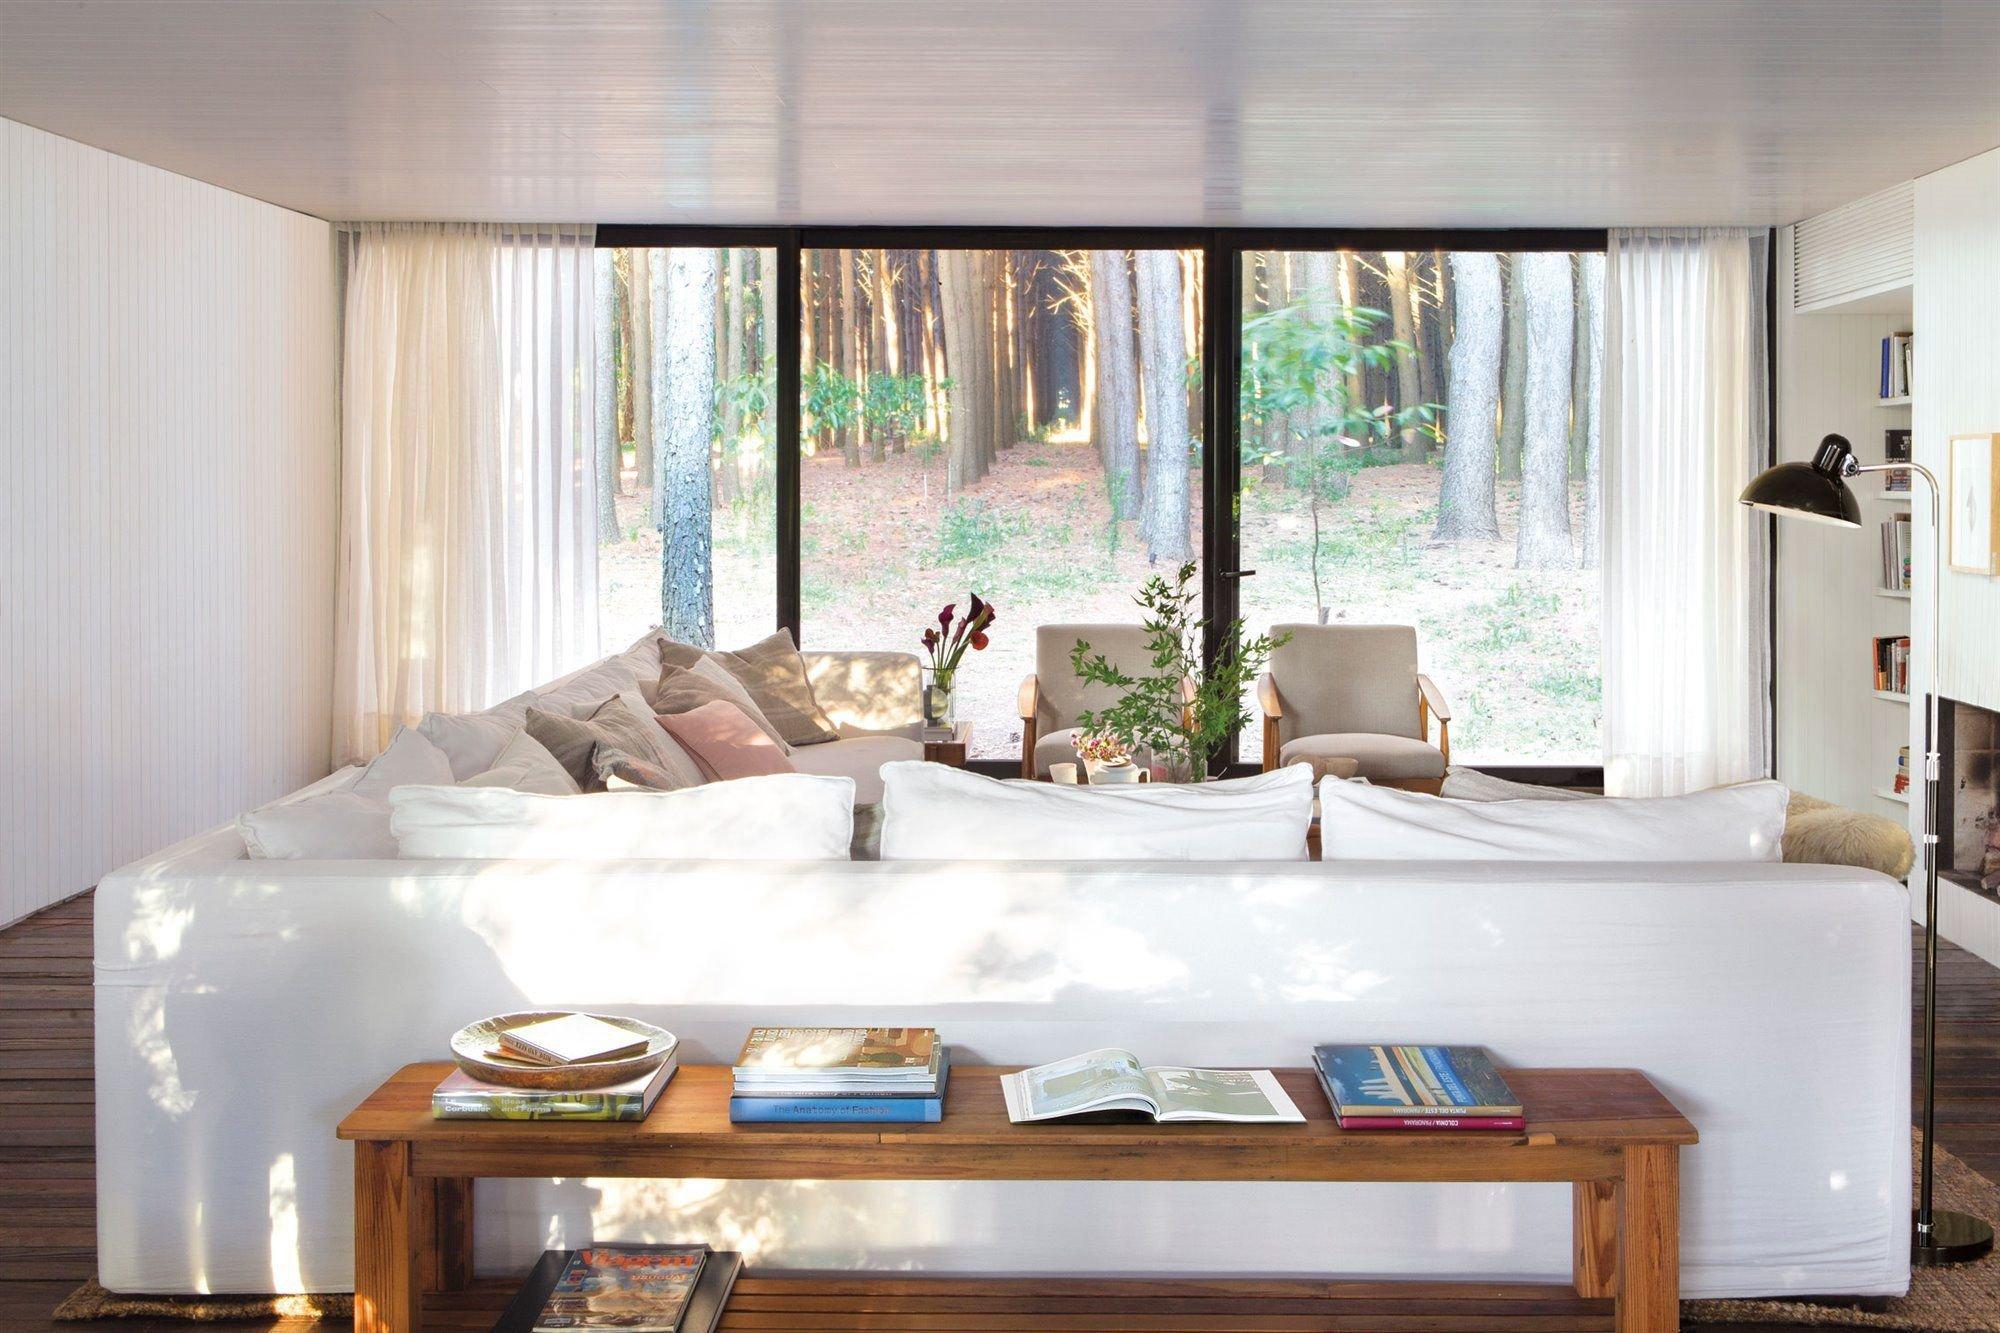 sofa separacao ambientes prego e martelo